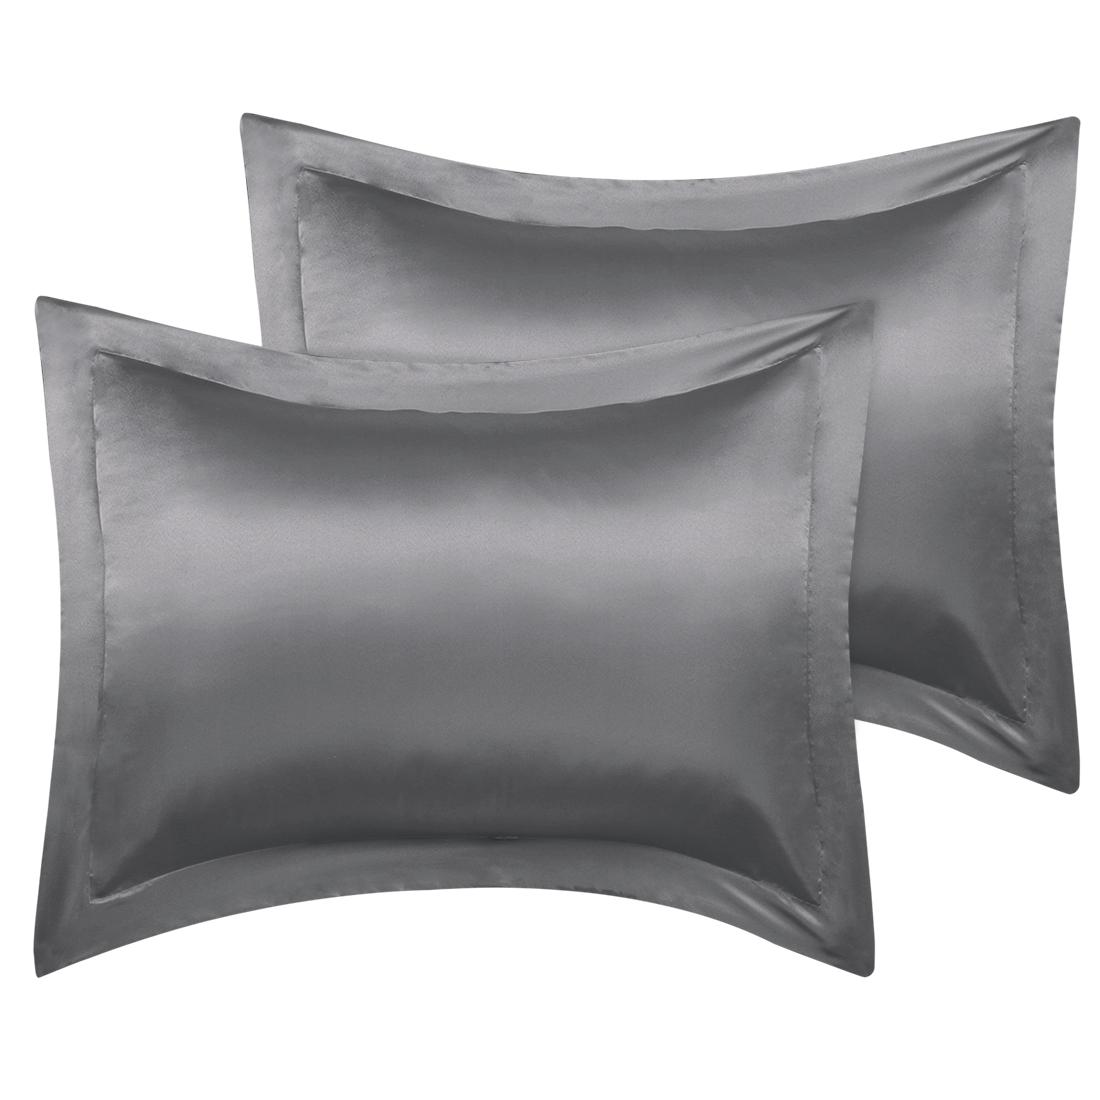 2 Pcs Deep Grey Pillow Shams Satin Pillow Cases Boudoir Oxford Pillowcases